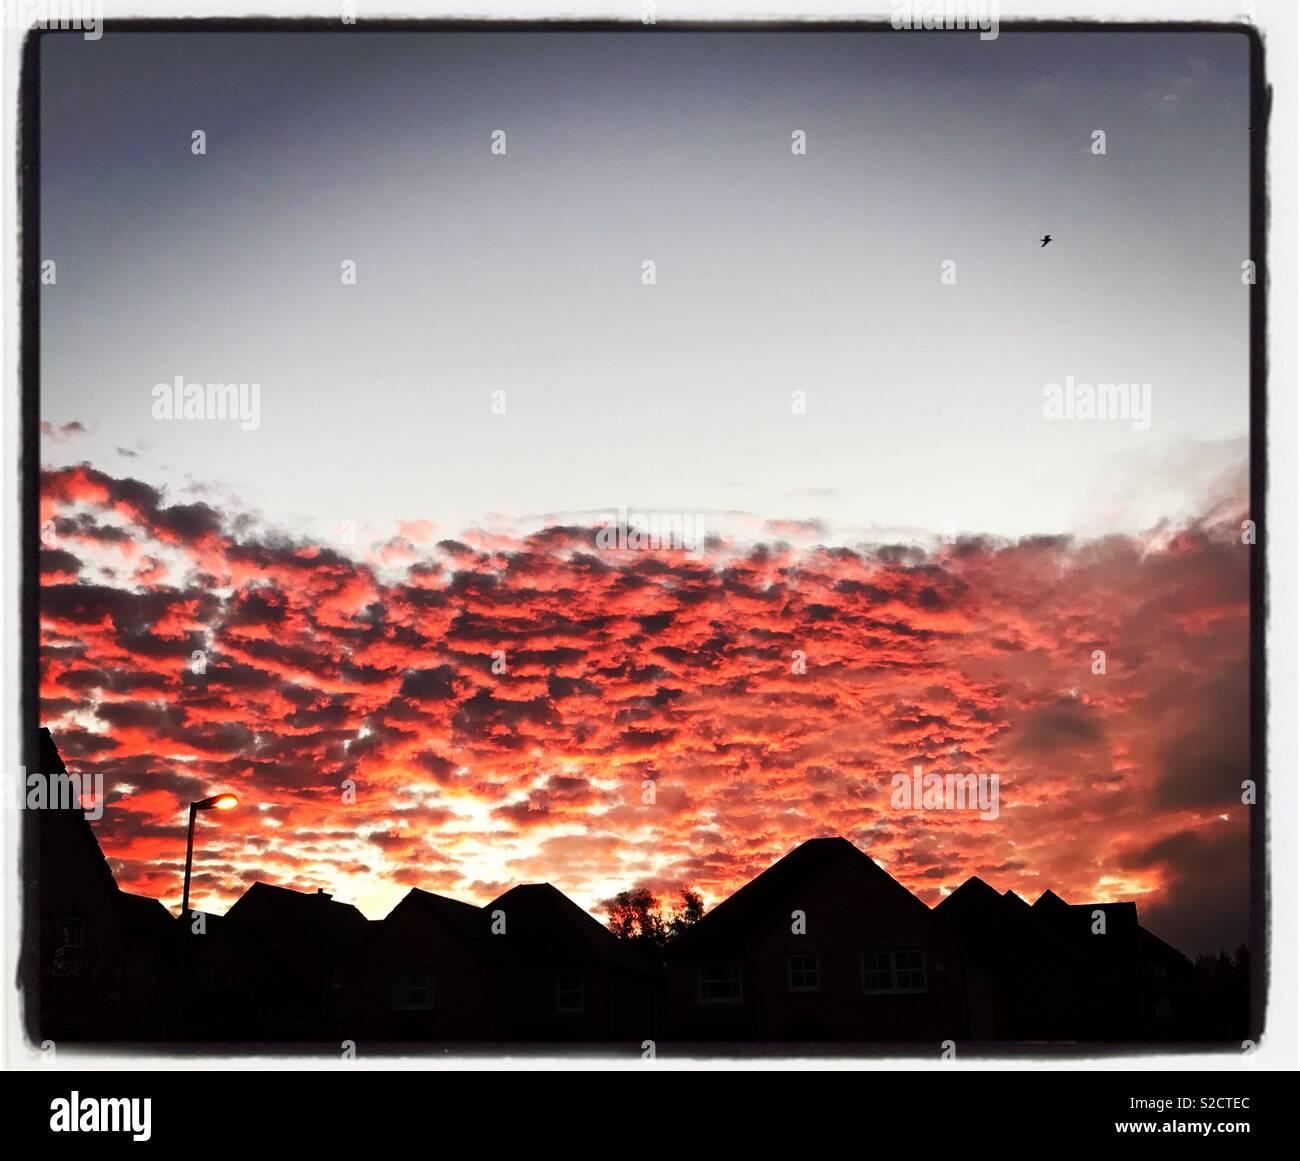 Early morning sky in Midlothian Scotland - Stock Image